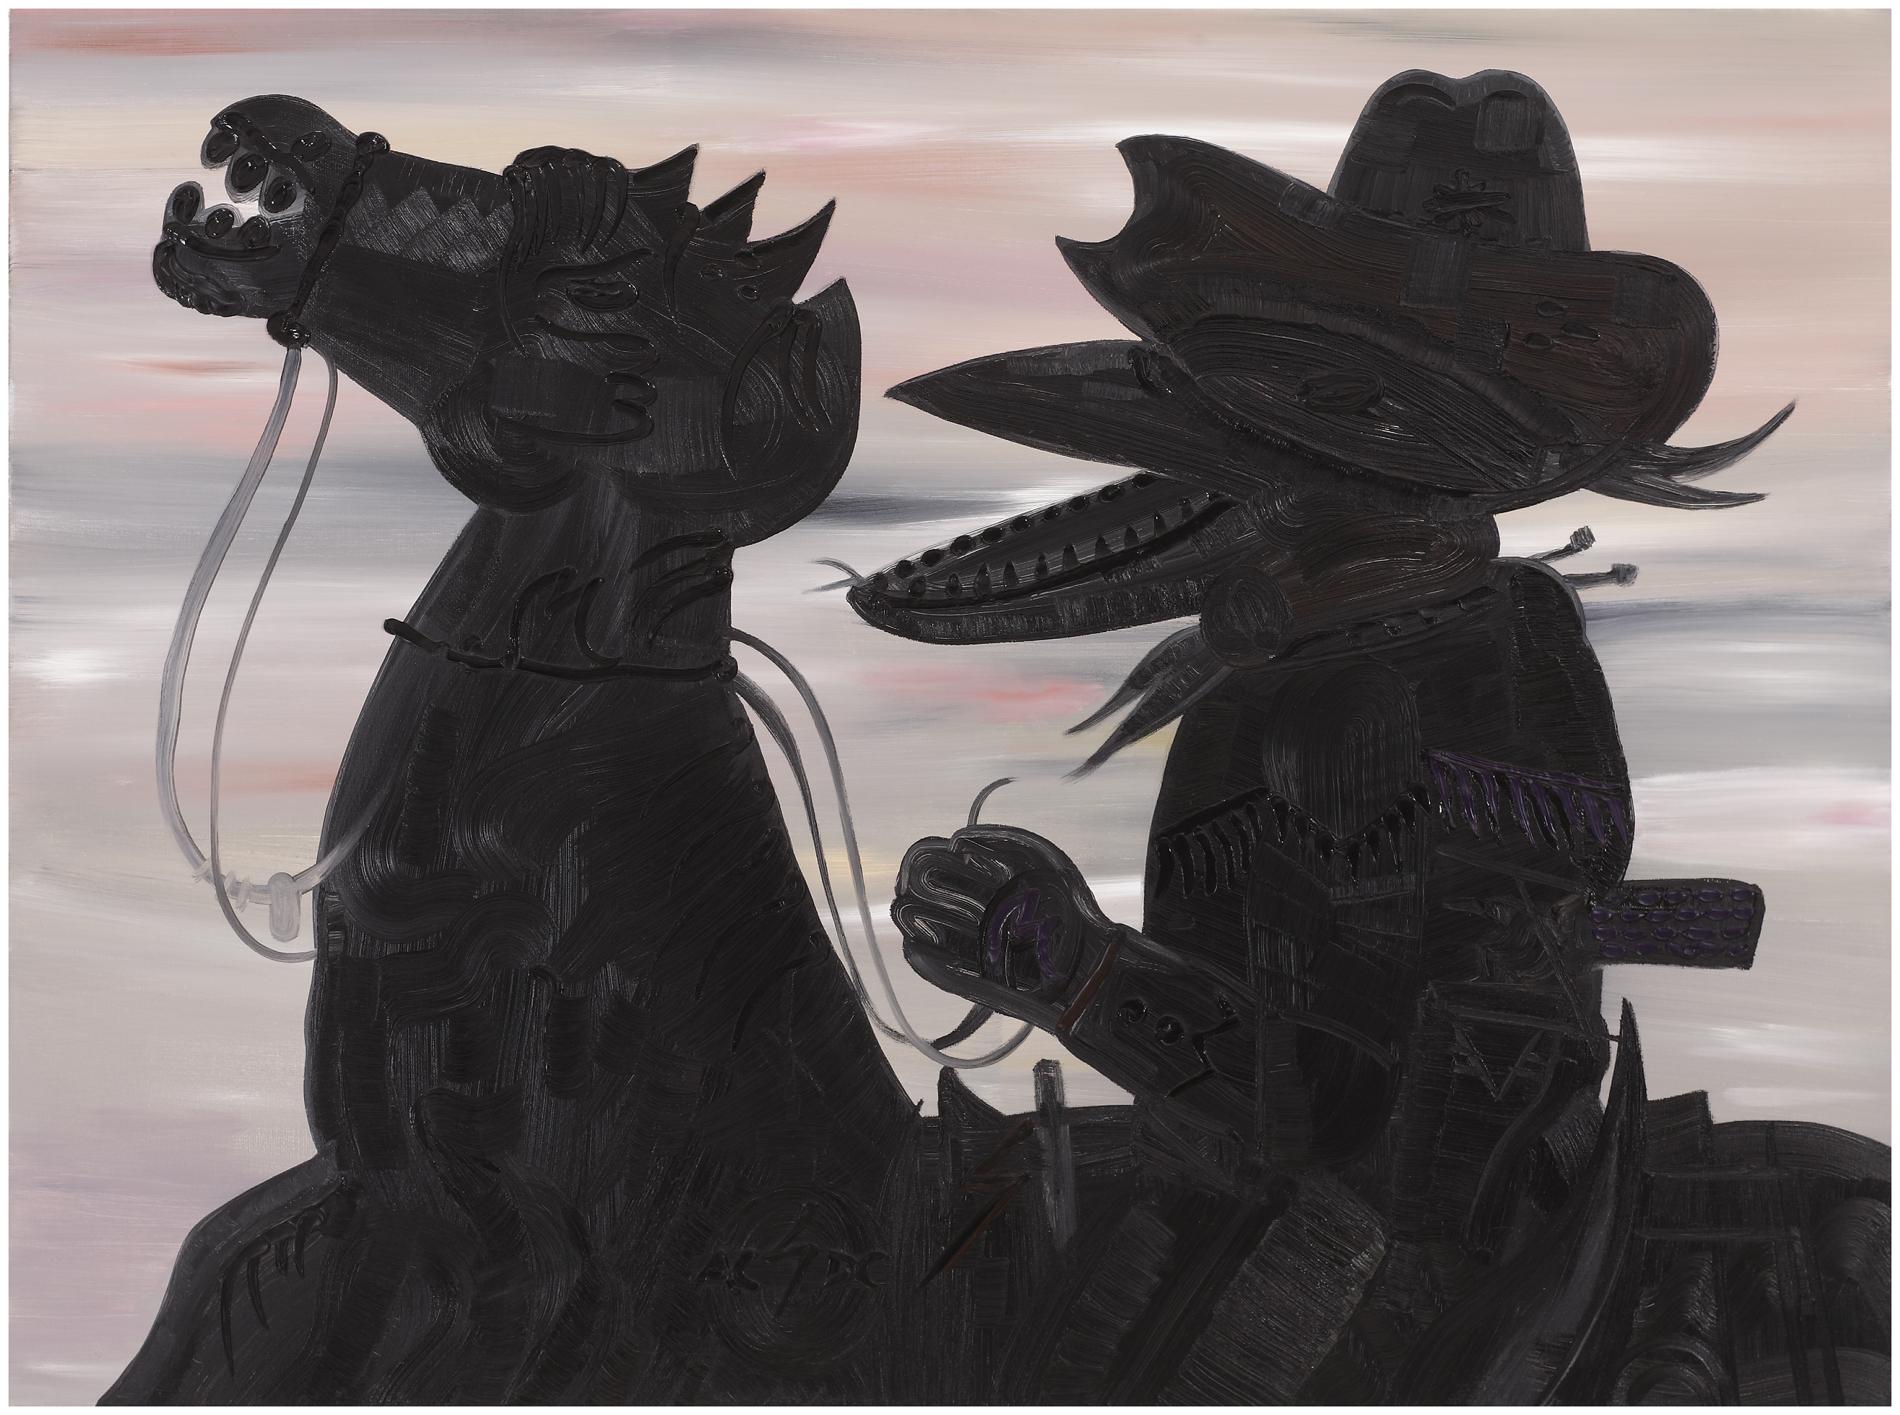 Abdul Vas. Into the Hole. The Lone Ranger, 2006